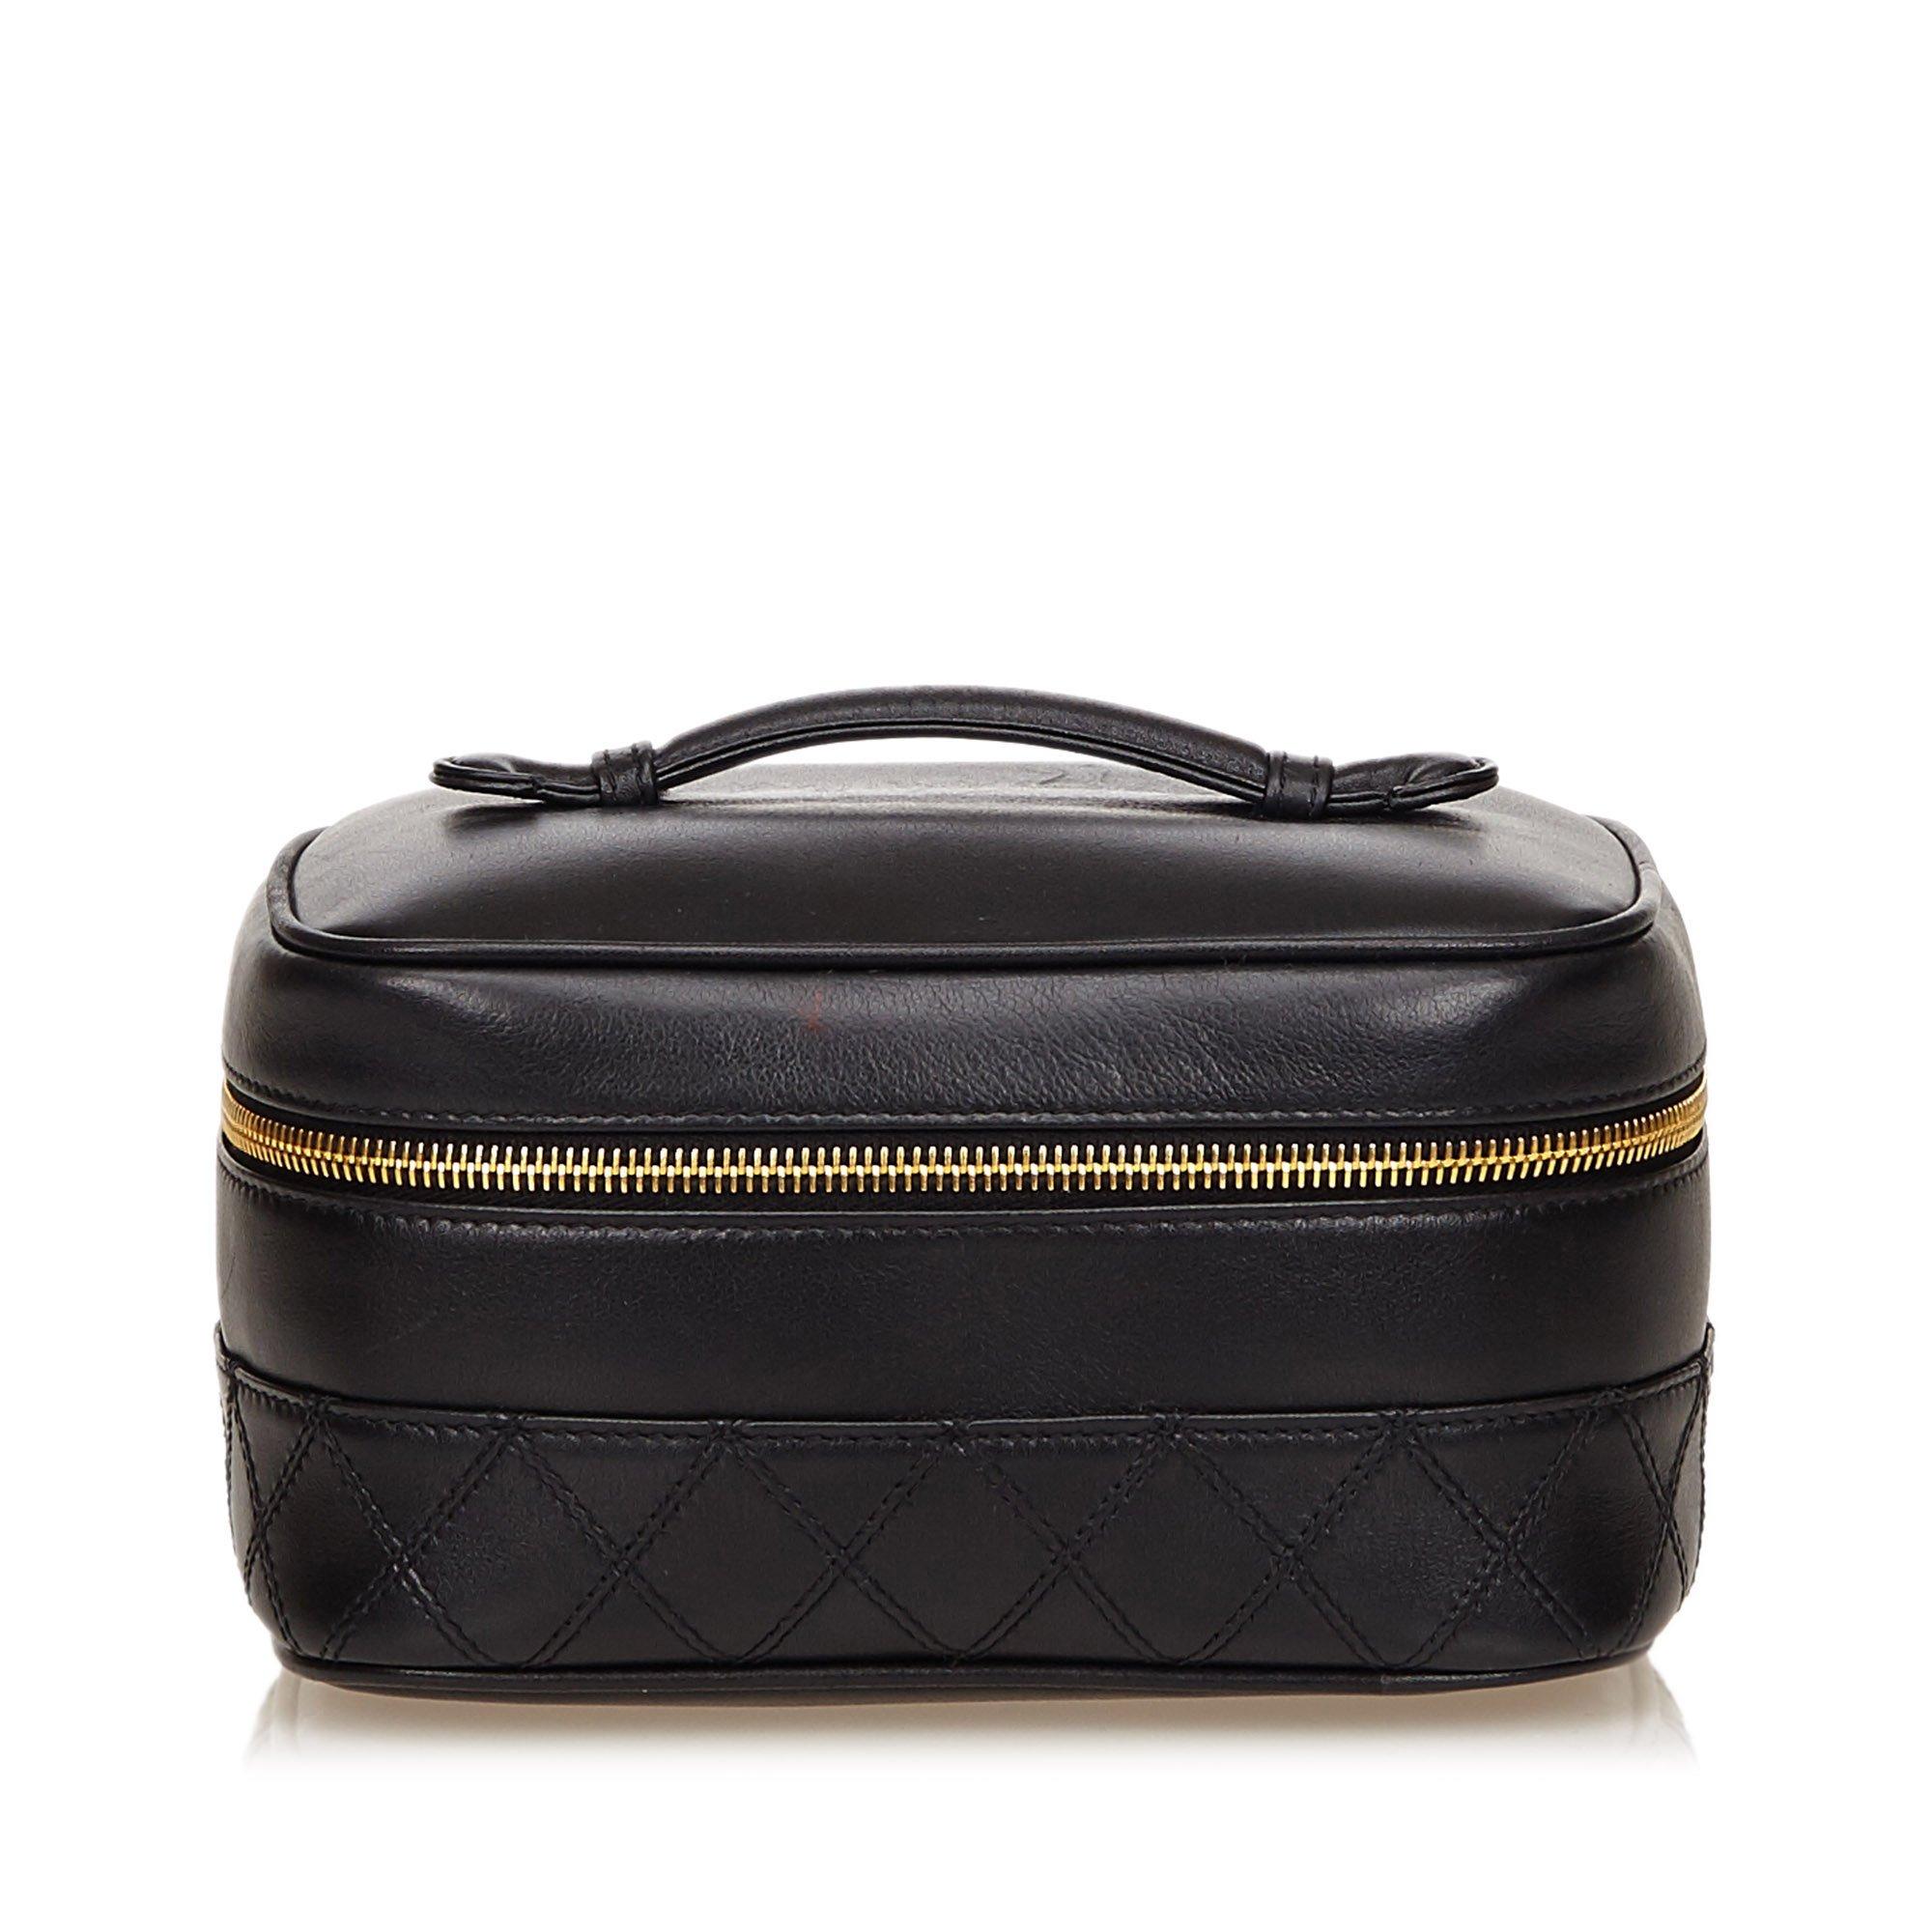 fe88ee035b3211 Buy Chanel Black Quilted Lambskin Vanity Case 41087 at best price | TLC